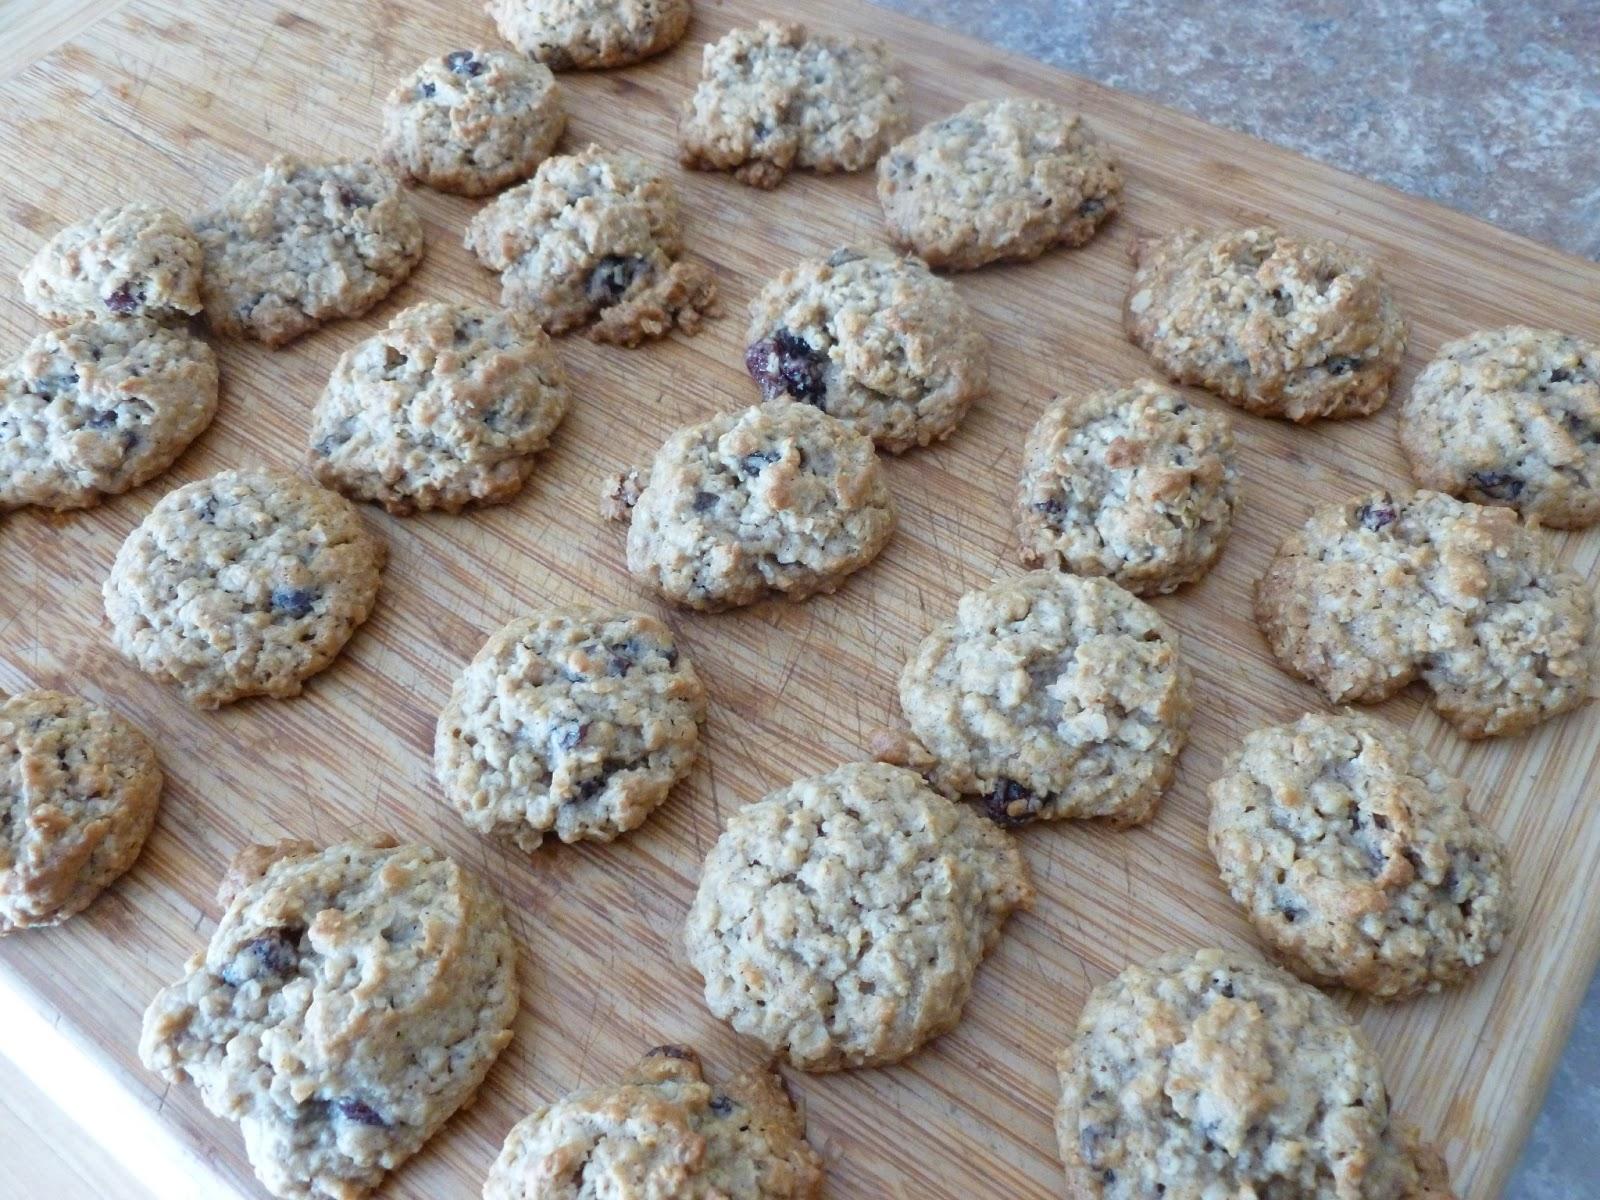 Mommy Plus Two Quaker Oats Vanishing Oatmeal Raisin Cookies